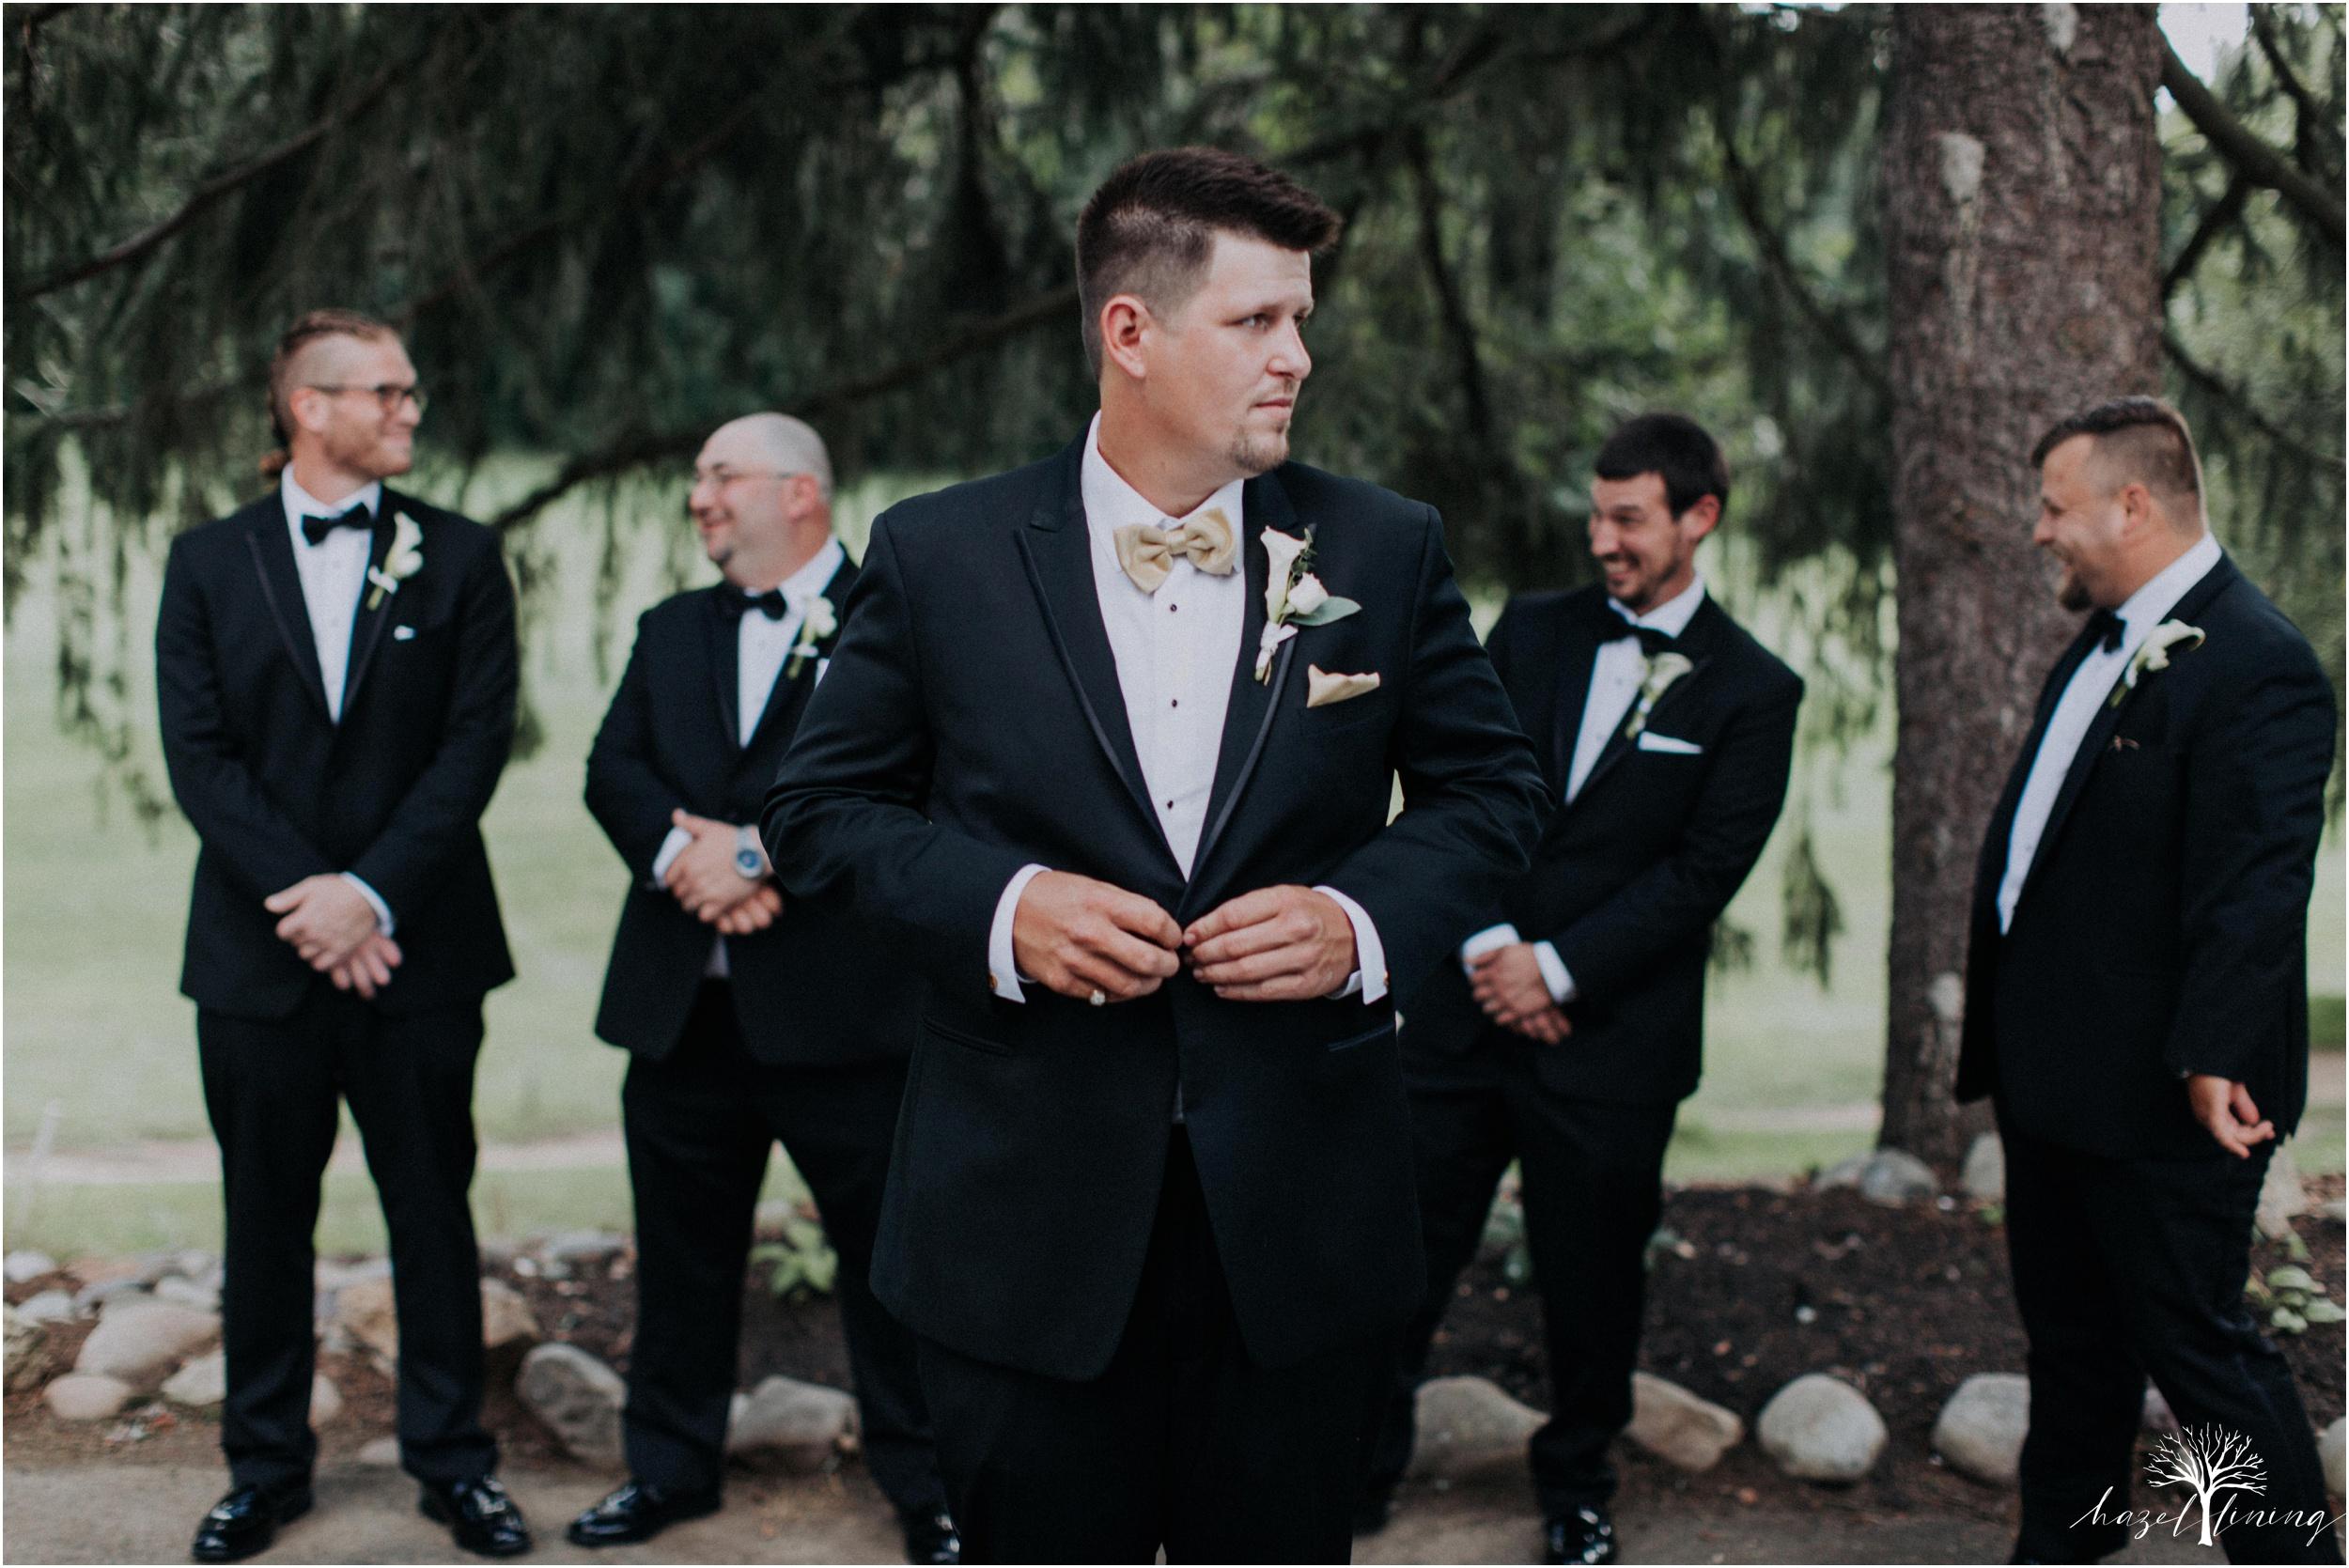 elizabeth-doelp-andrew-foreback-middletown-country-club-summer-langhorne-pennsylvania-wedding-hazel-lining-travel-wedding-elopement-photography_0068.jpg